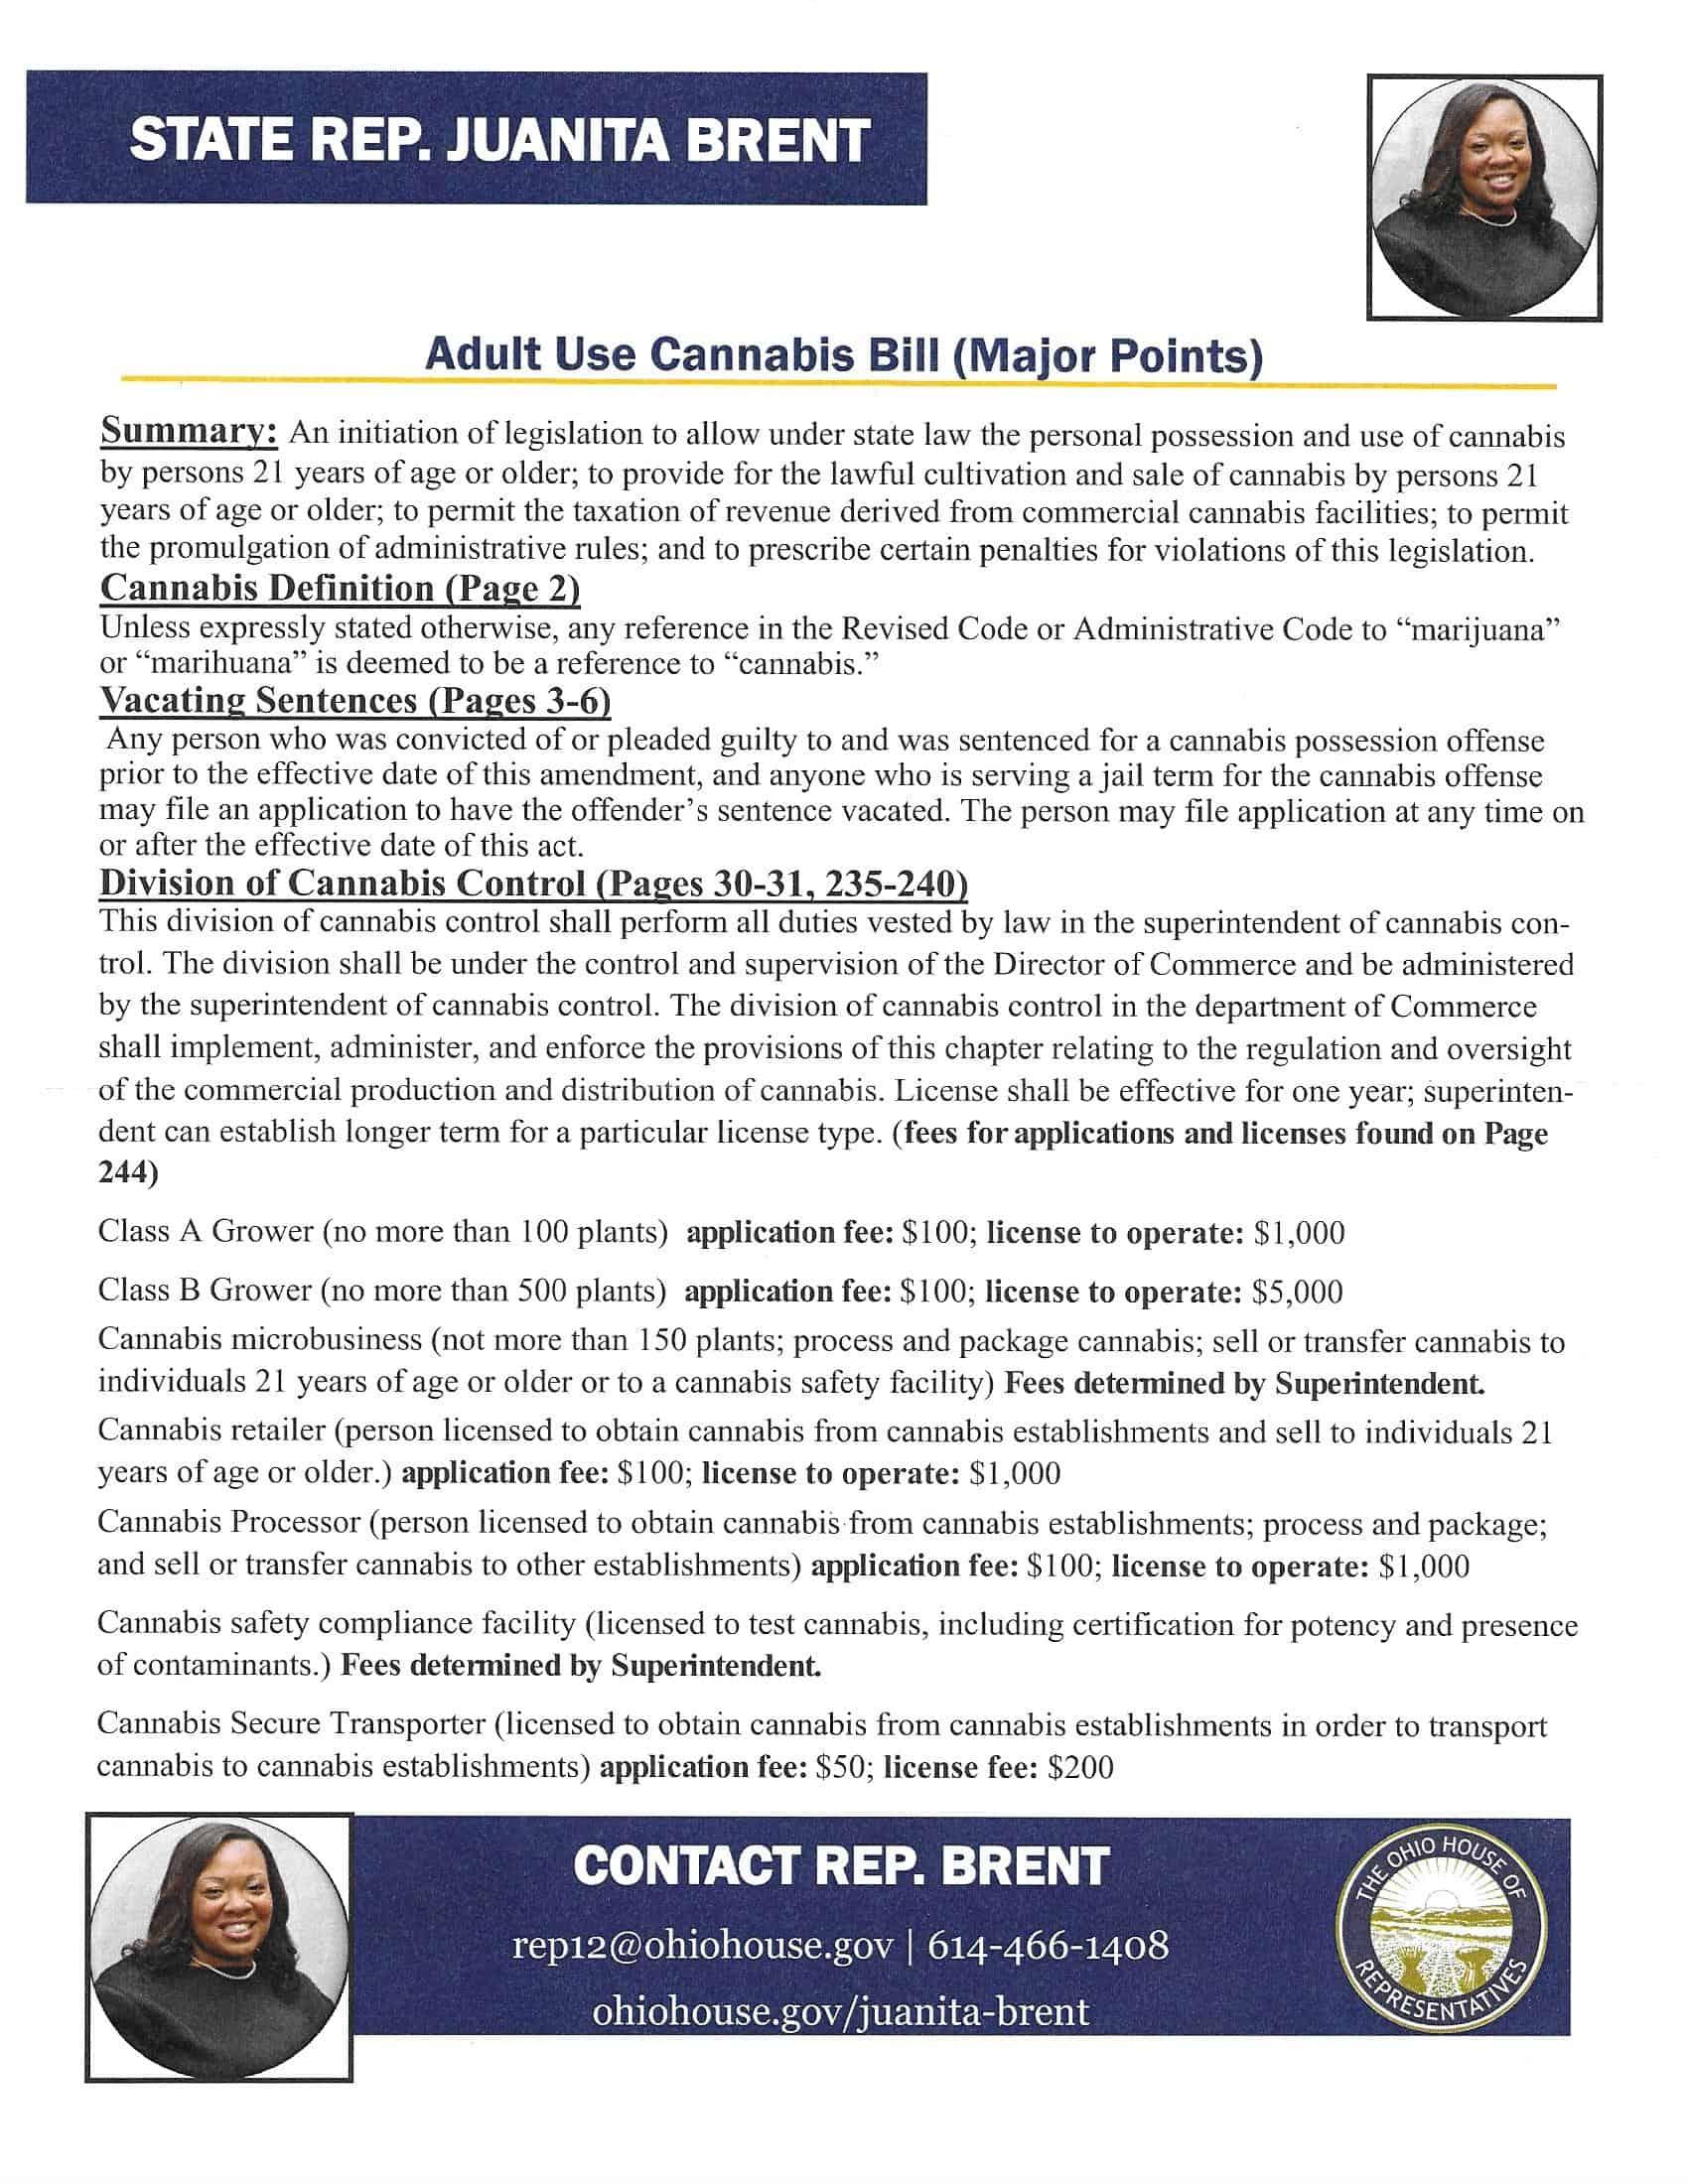 Juanita Brent Adult Use Proposal 2020 Page 1